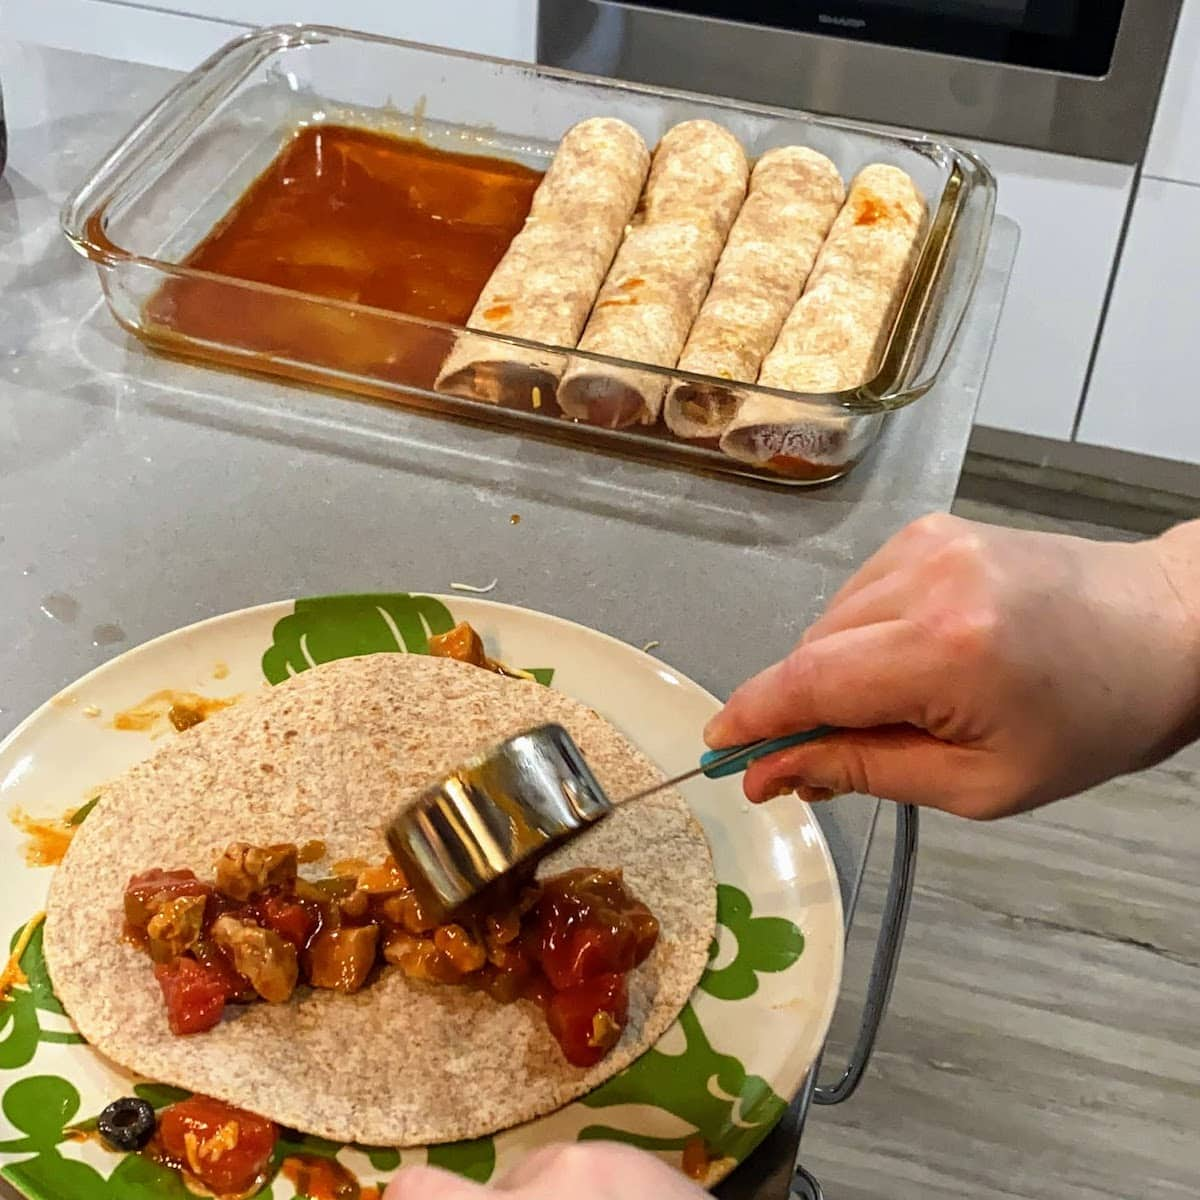 person assembling enchiladas